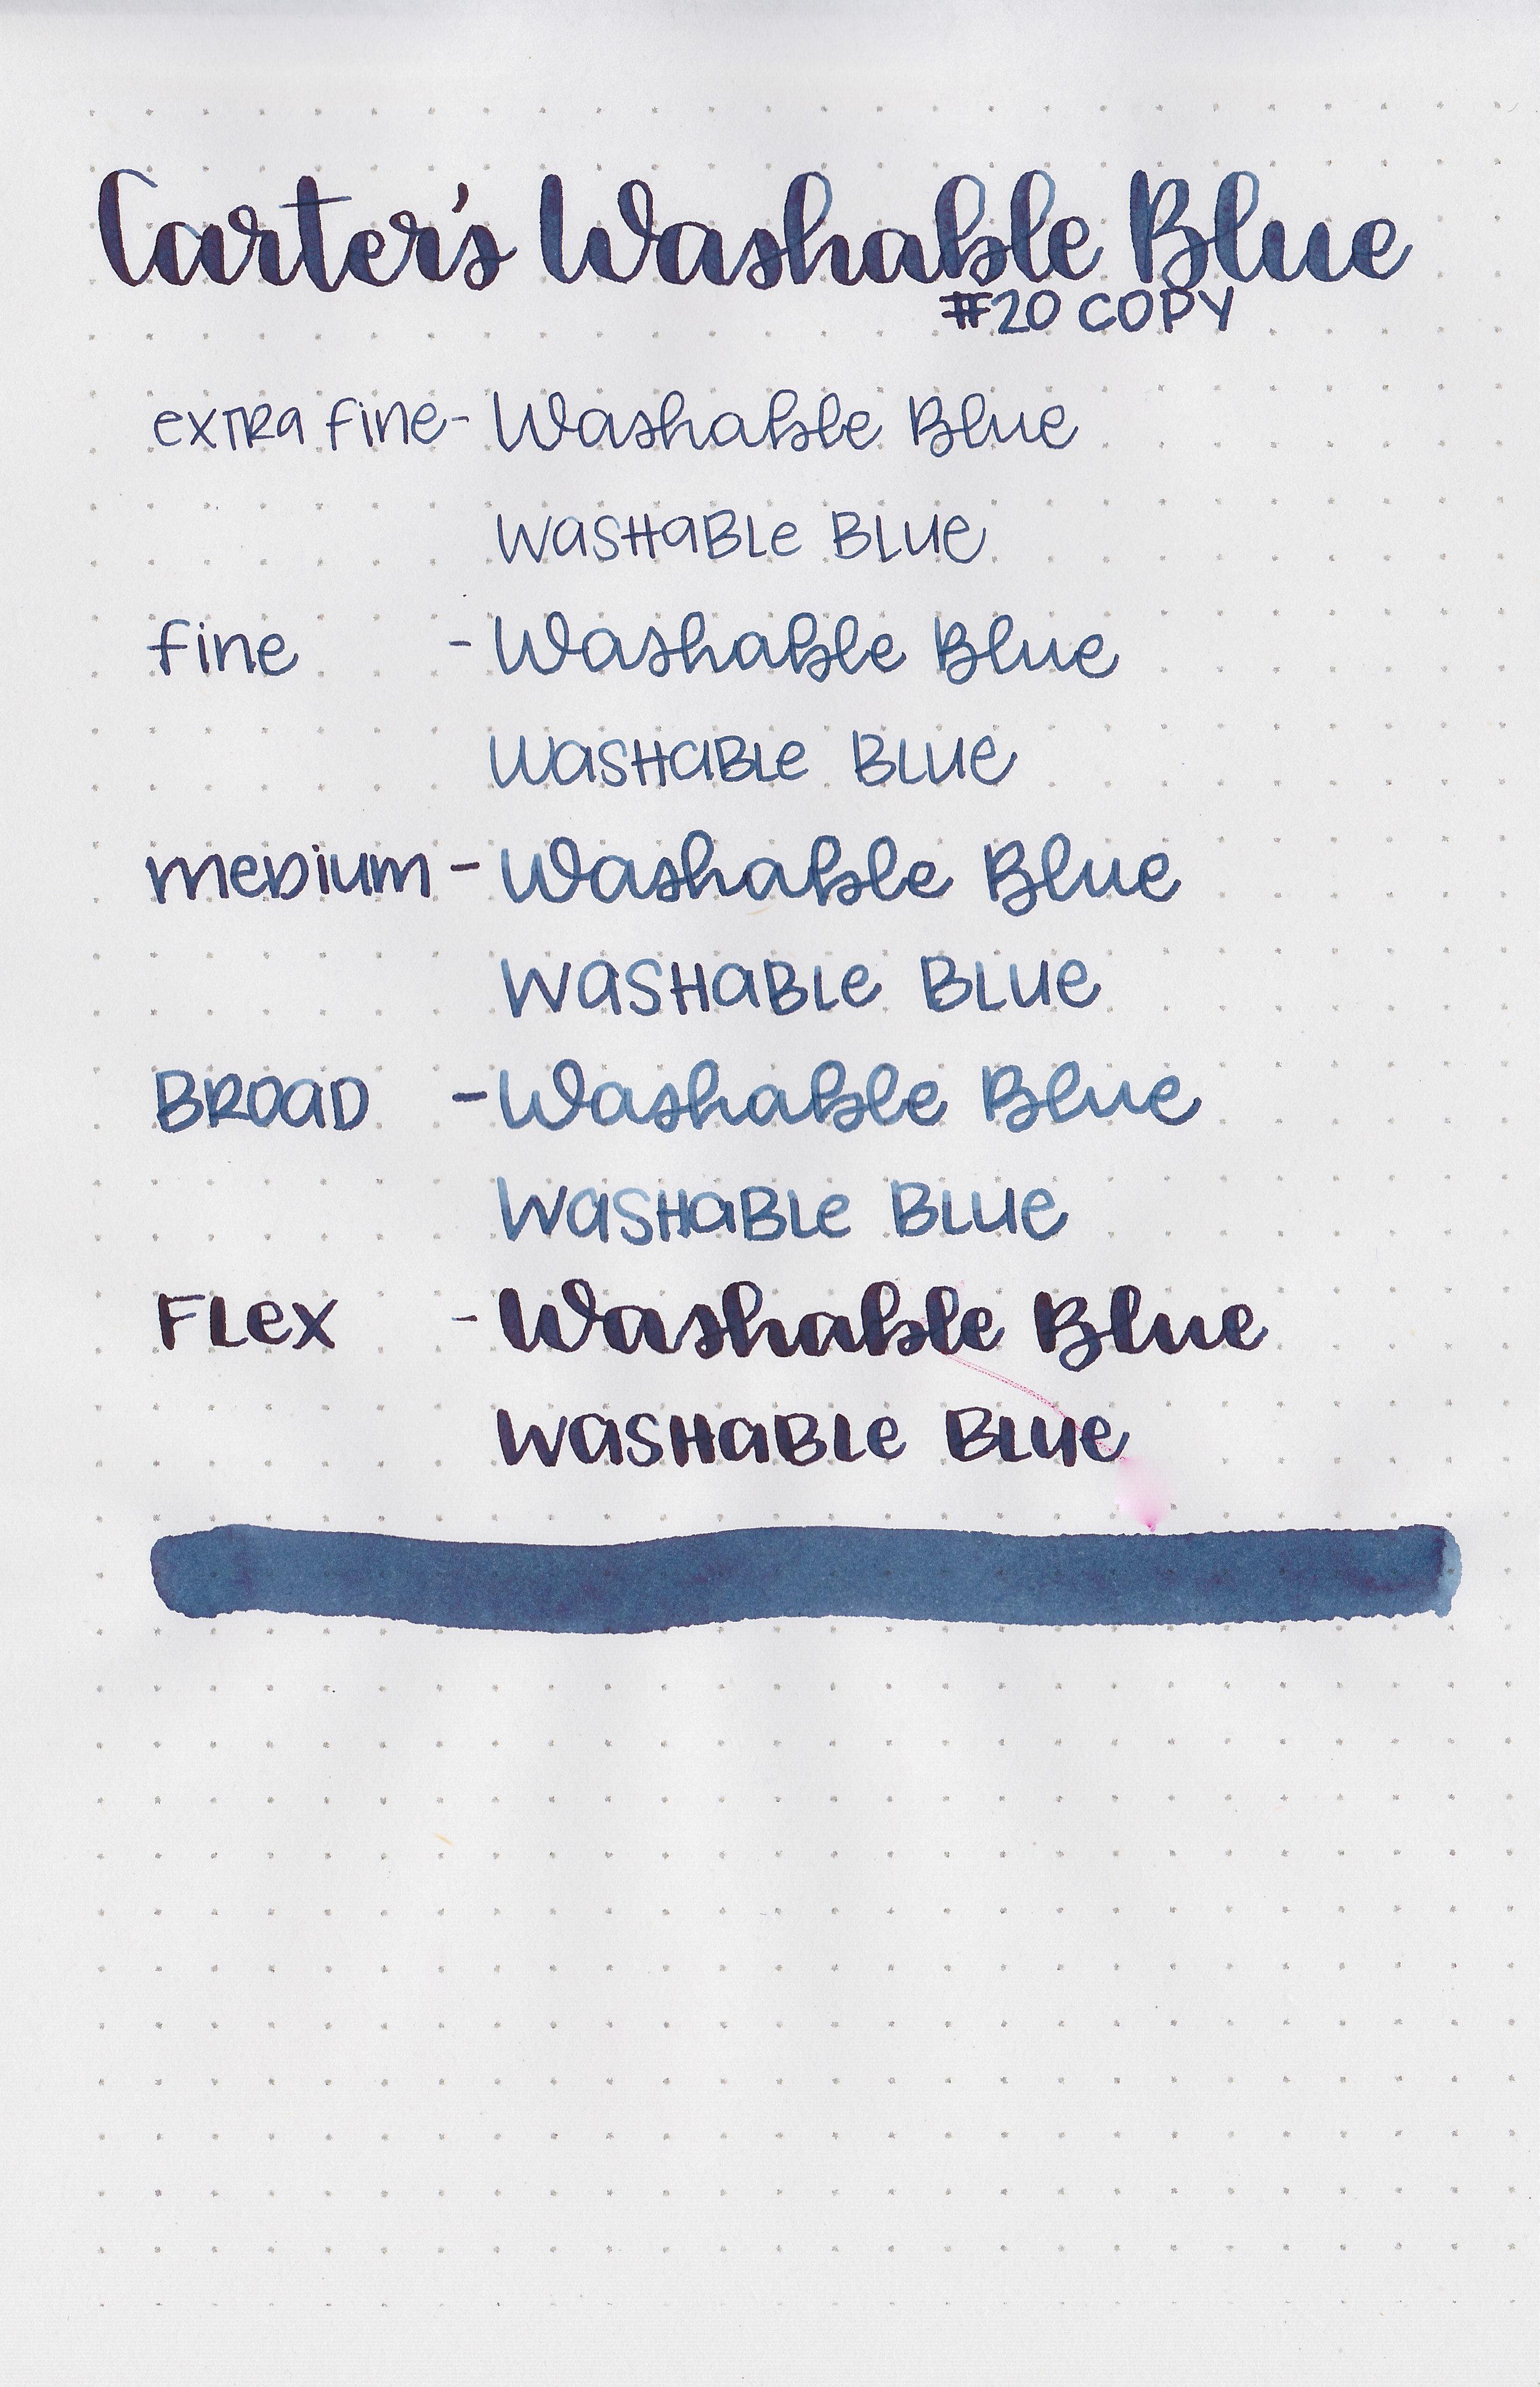 cart-washable-blue-10.jpg